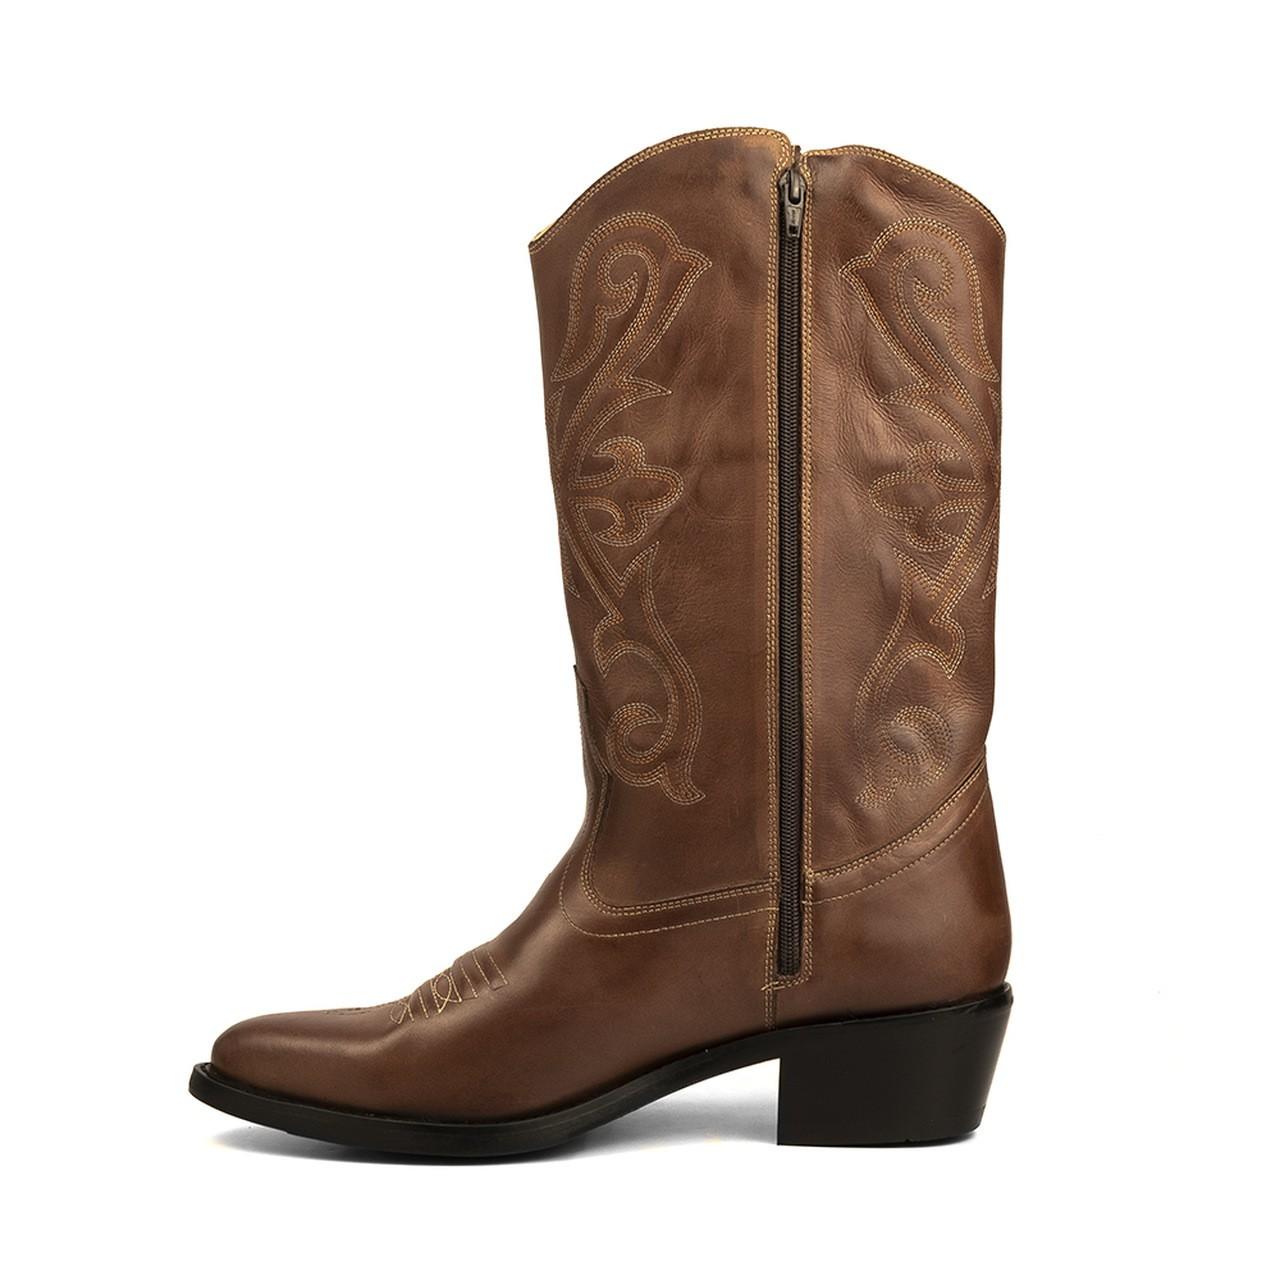 Bota Texana HB Agabe Boots 200.004 - Lt Marrom - Solado de Couro com Borracha